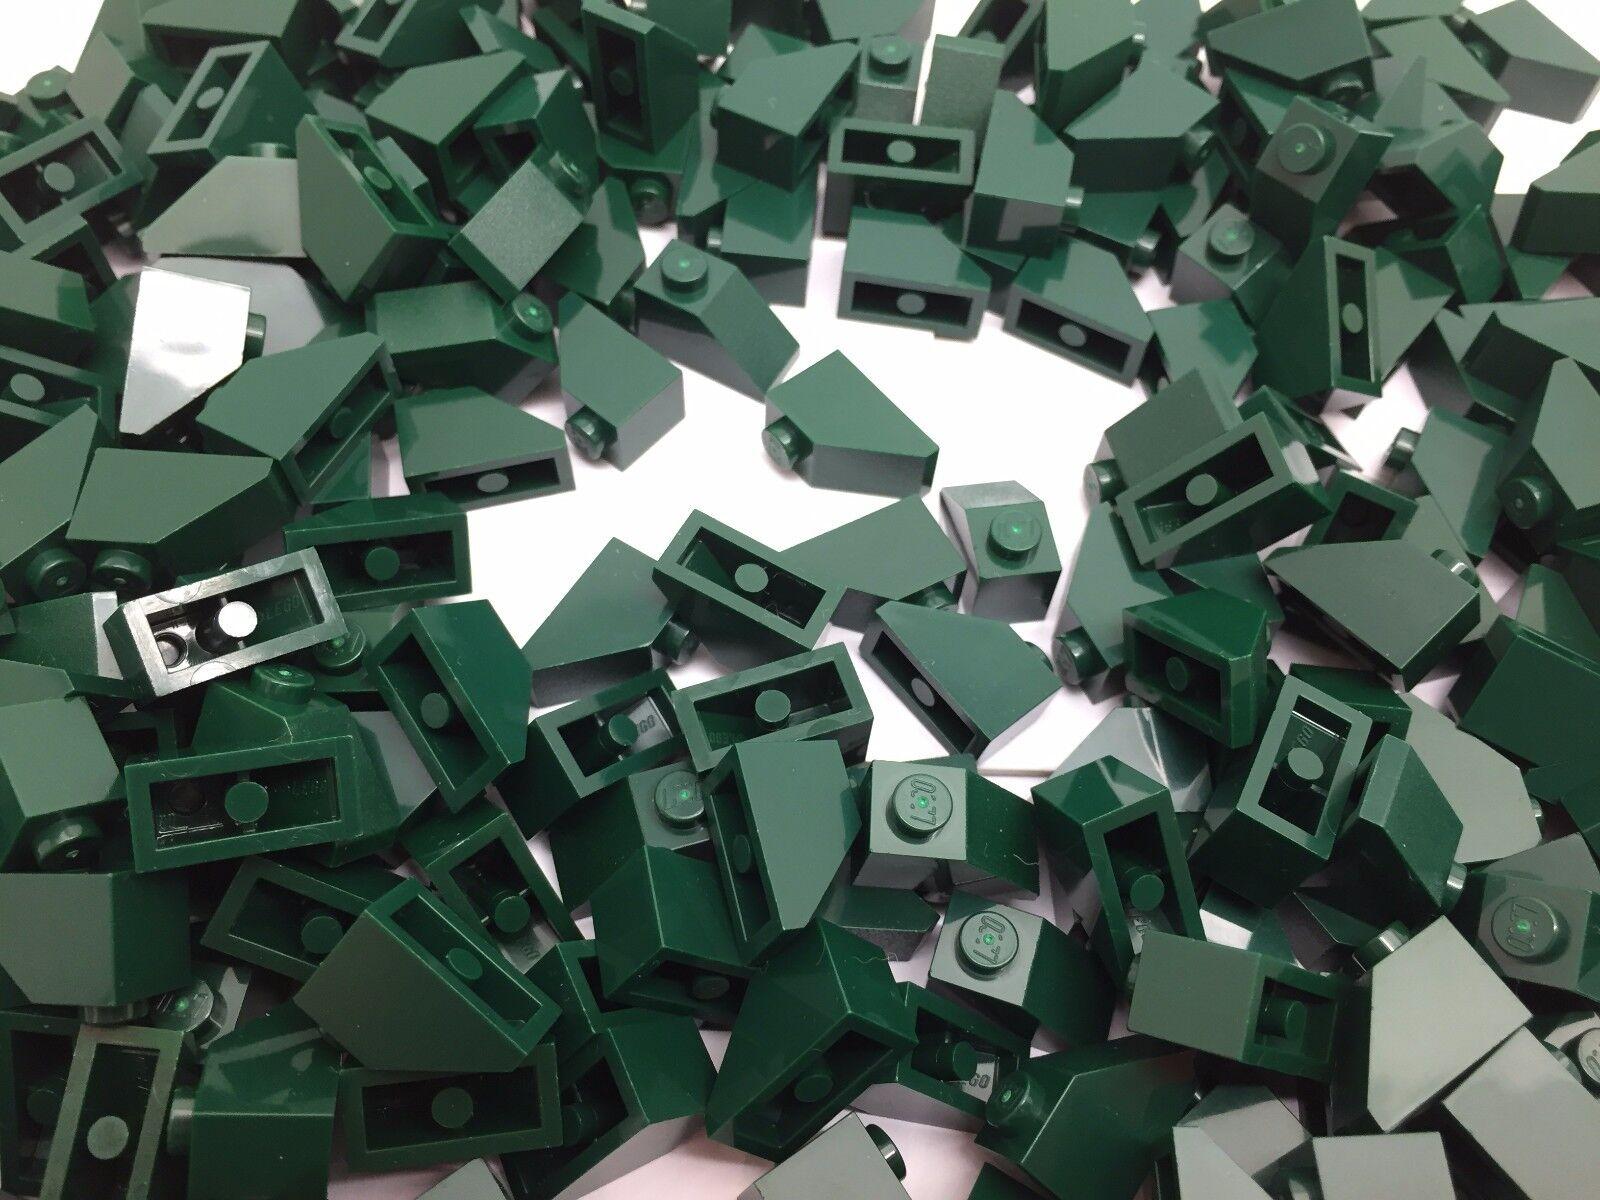 Lego 3040 - Dark Earth green pente toit carreau 1x2 45 D. ANGLE - 10,25,50 pièces